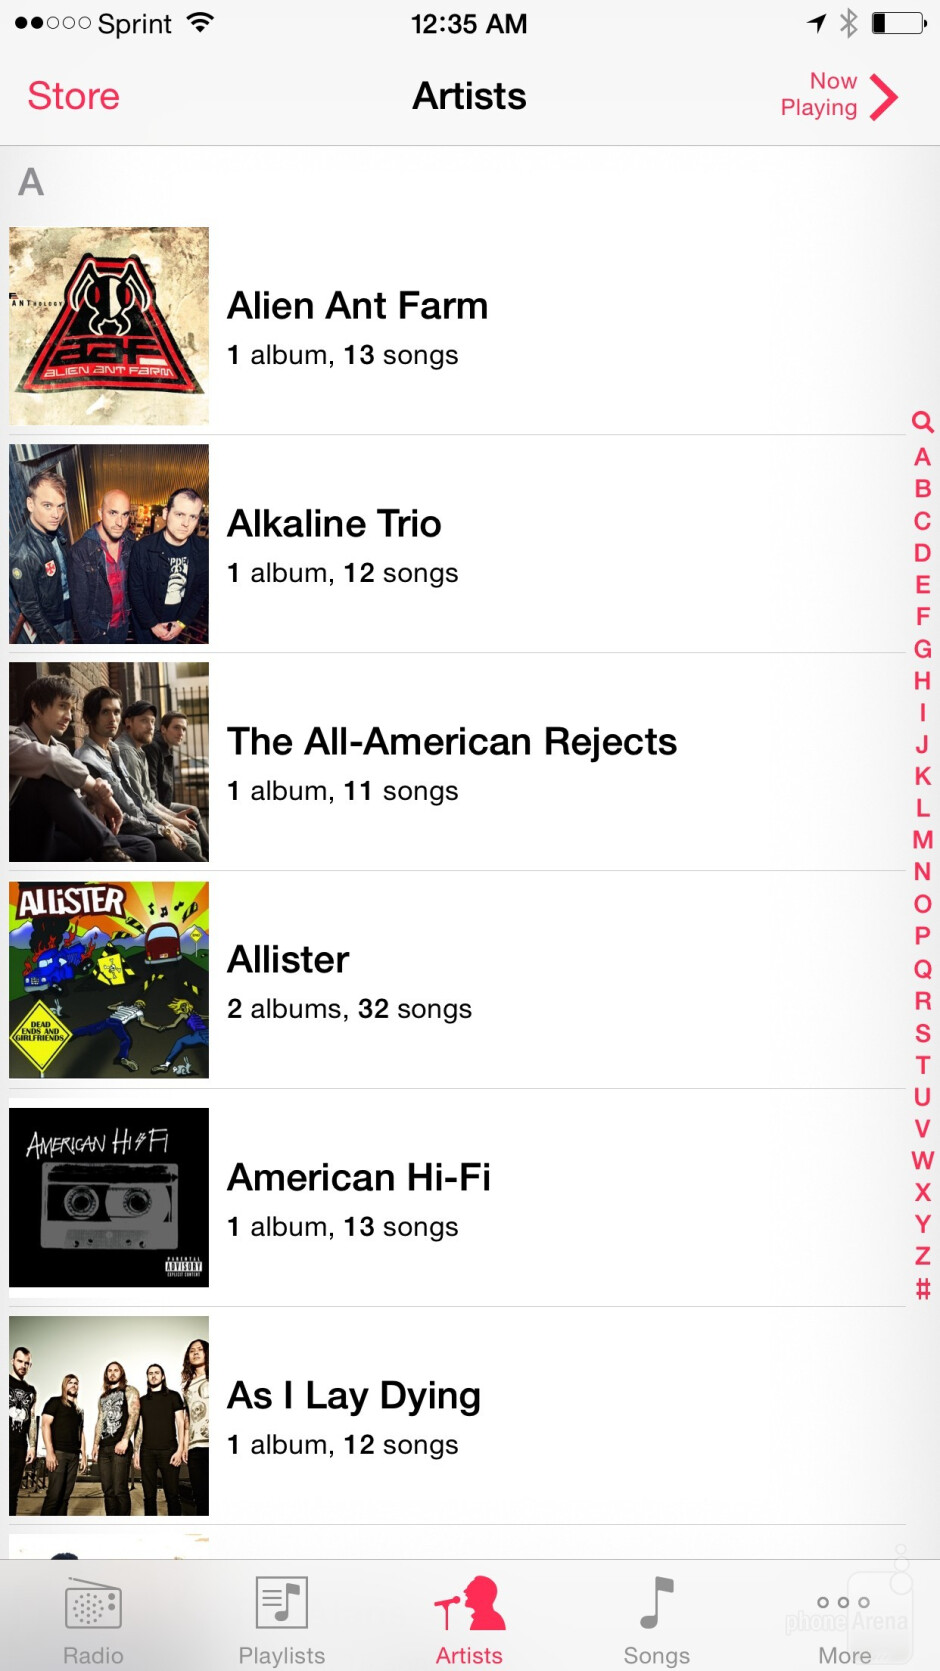 Playing music on the Apple iPhone 6 Plus - Google Nexus 6 vs Apple iPhone 6 Plus